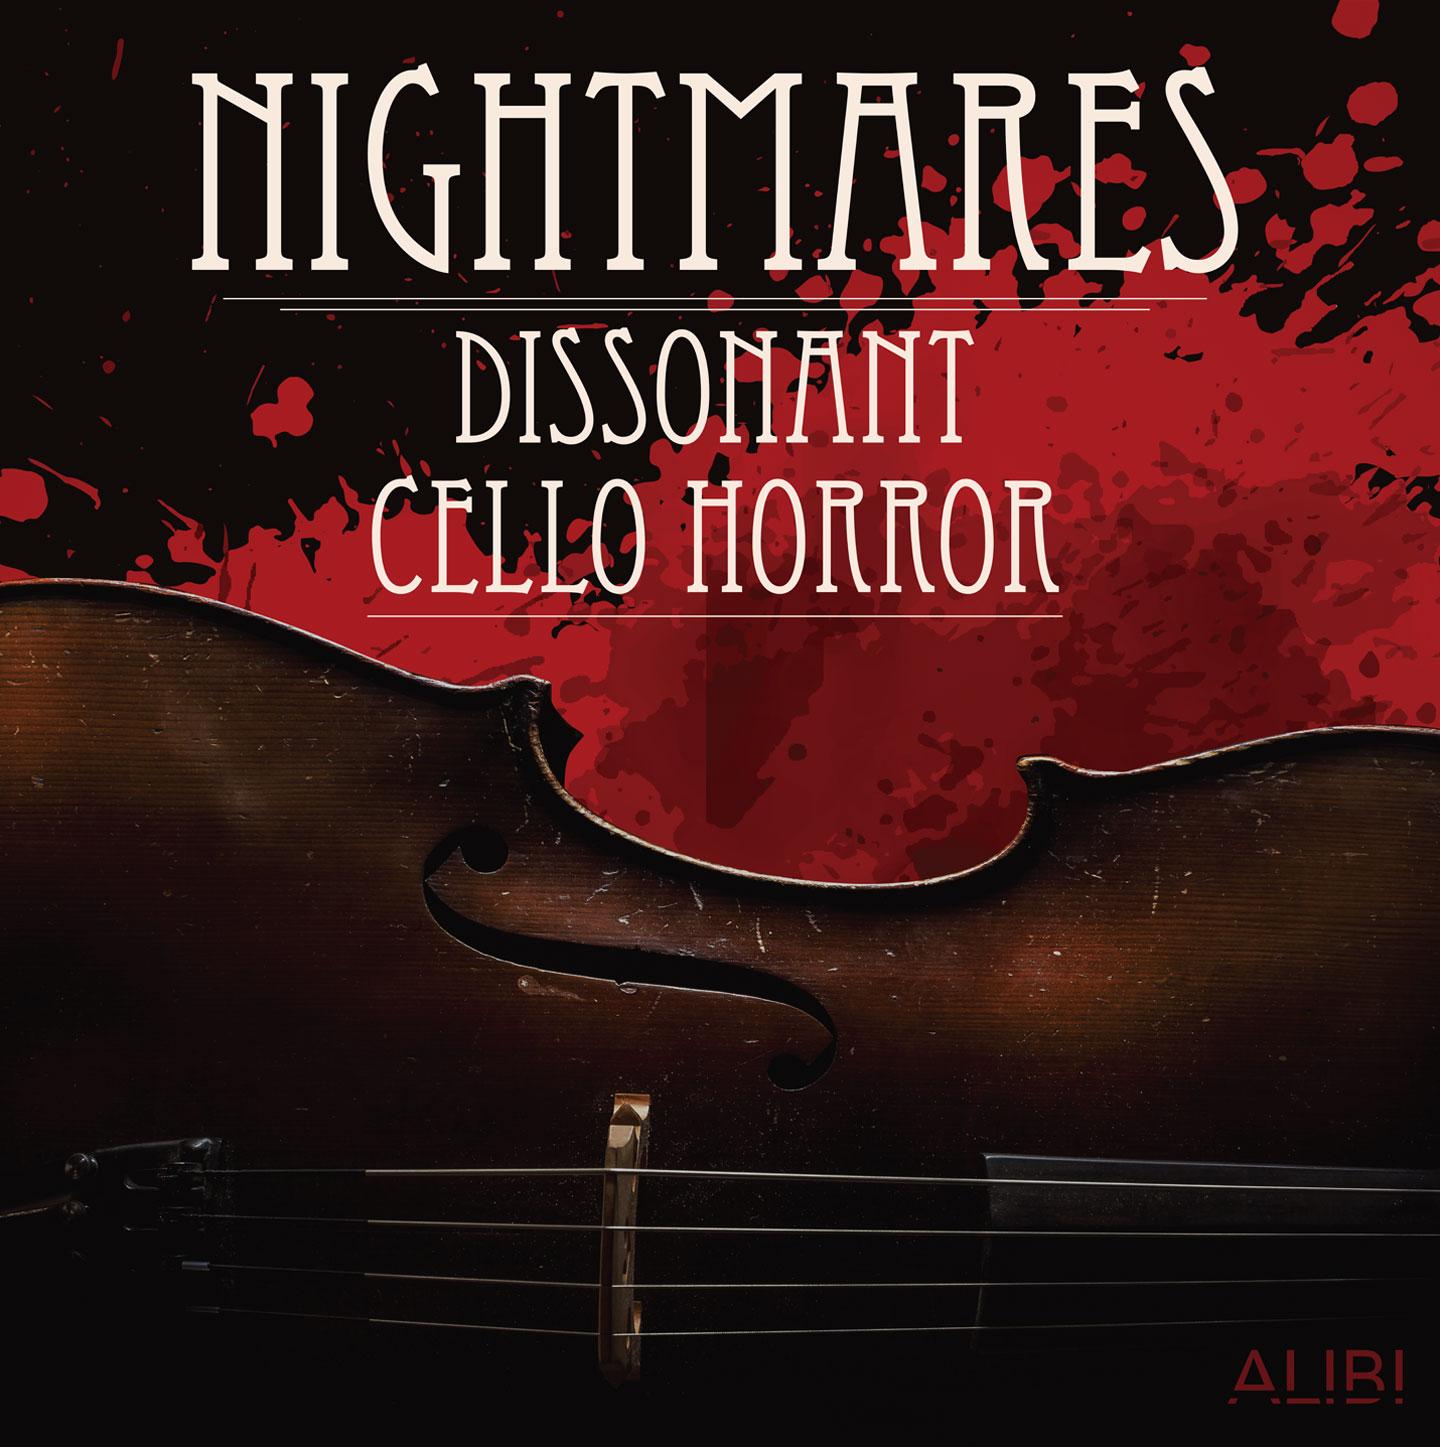 Nightmares: Dissonant Cello Horror. Alibi Music Library. Cello; blood spatter